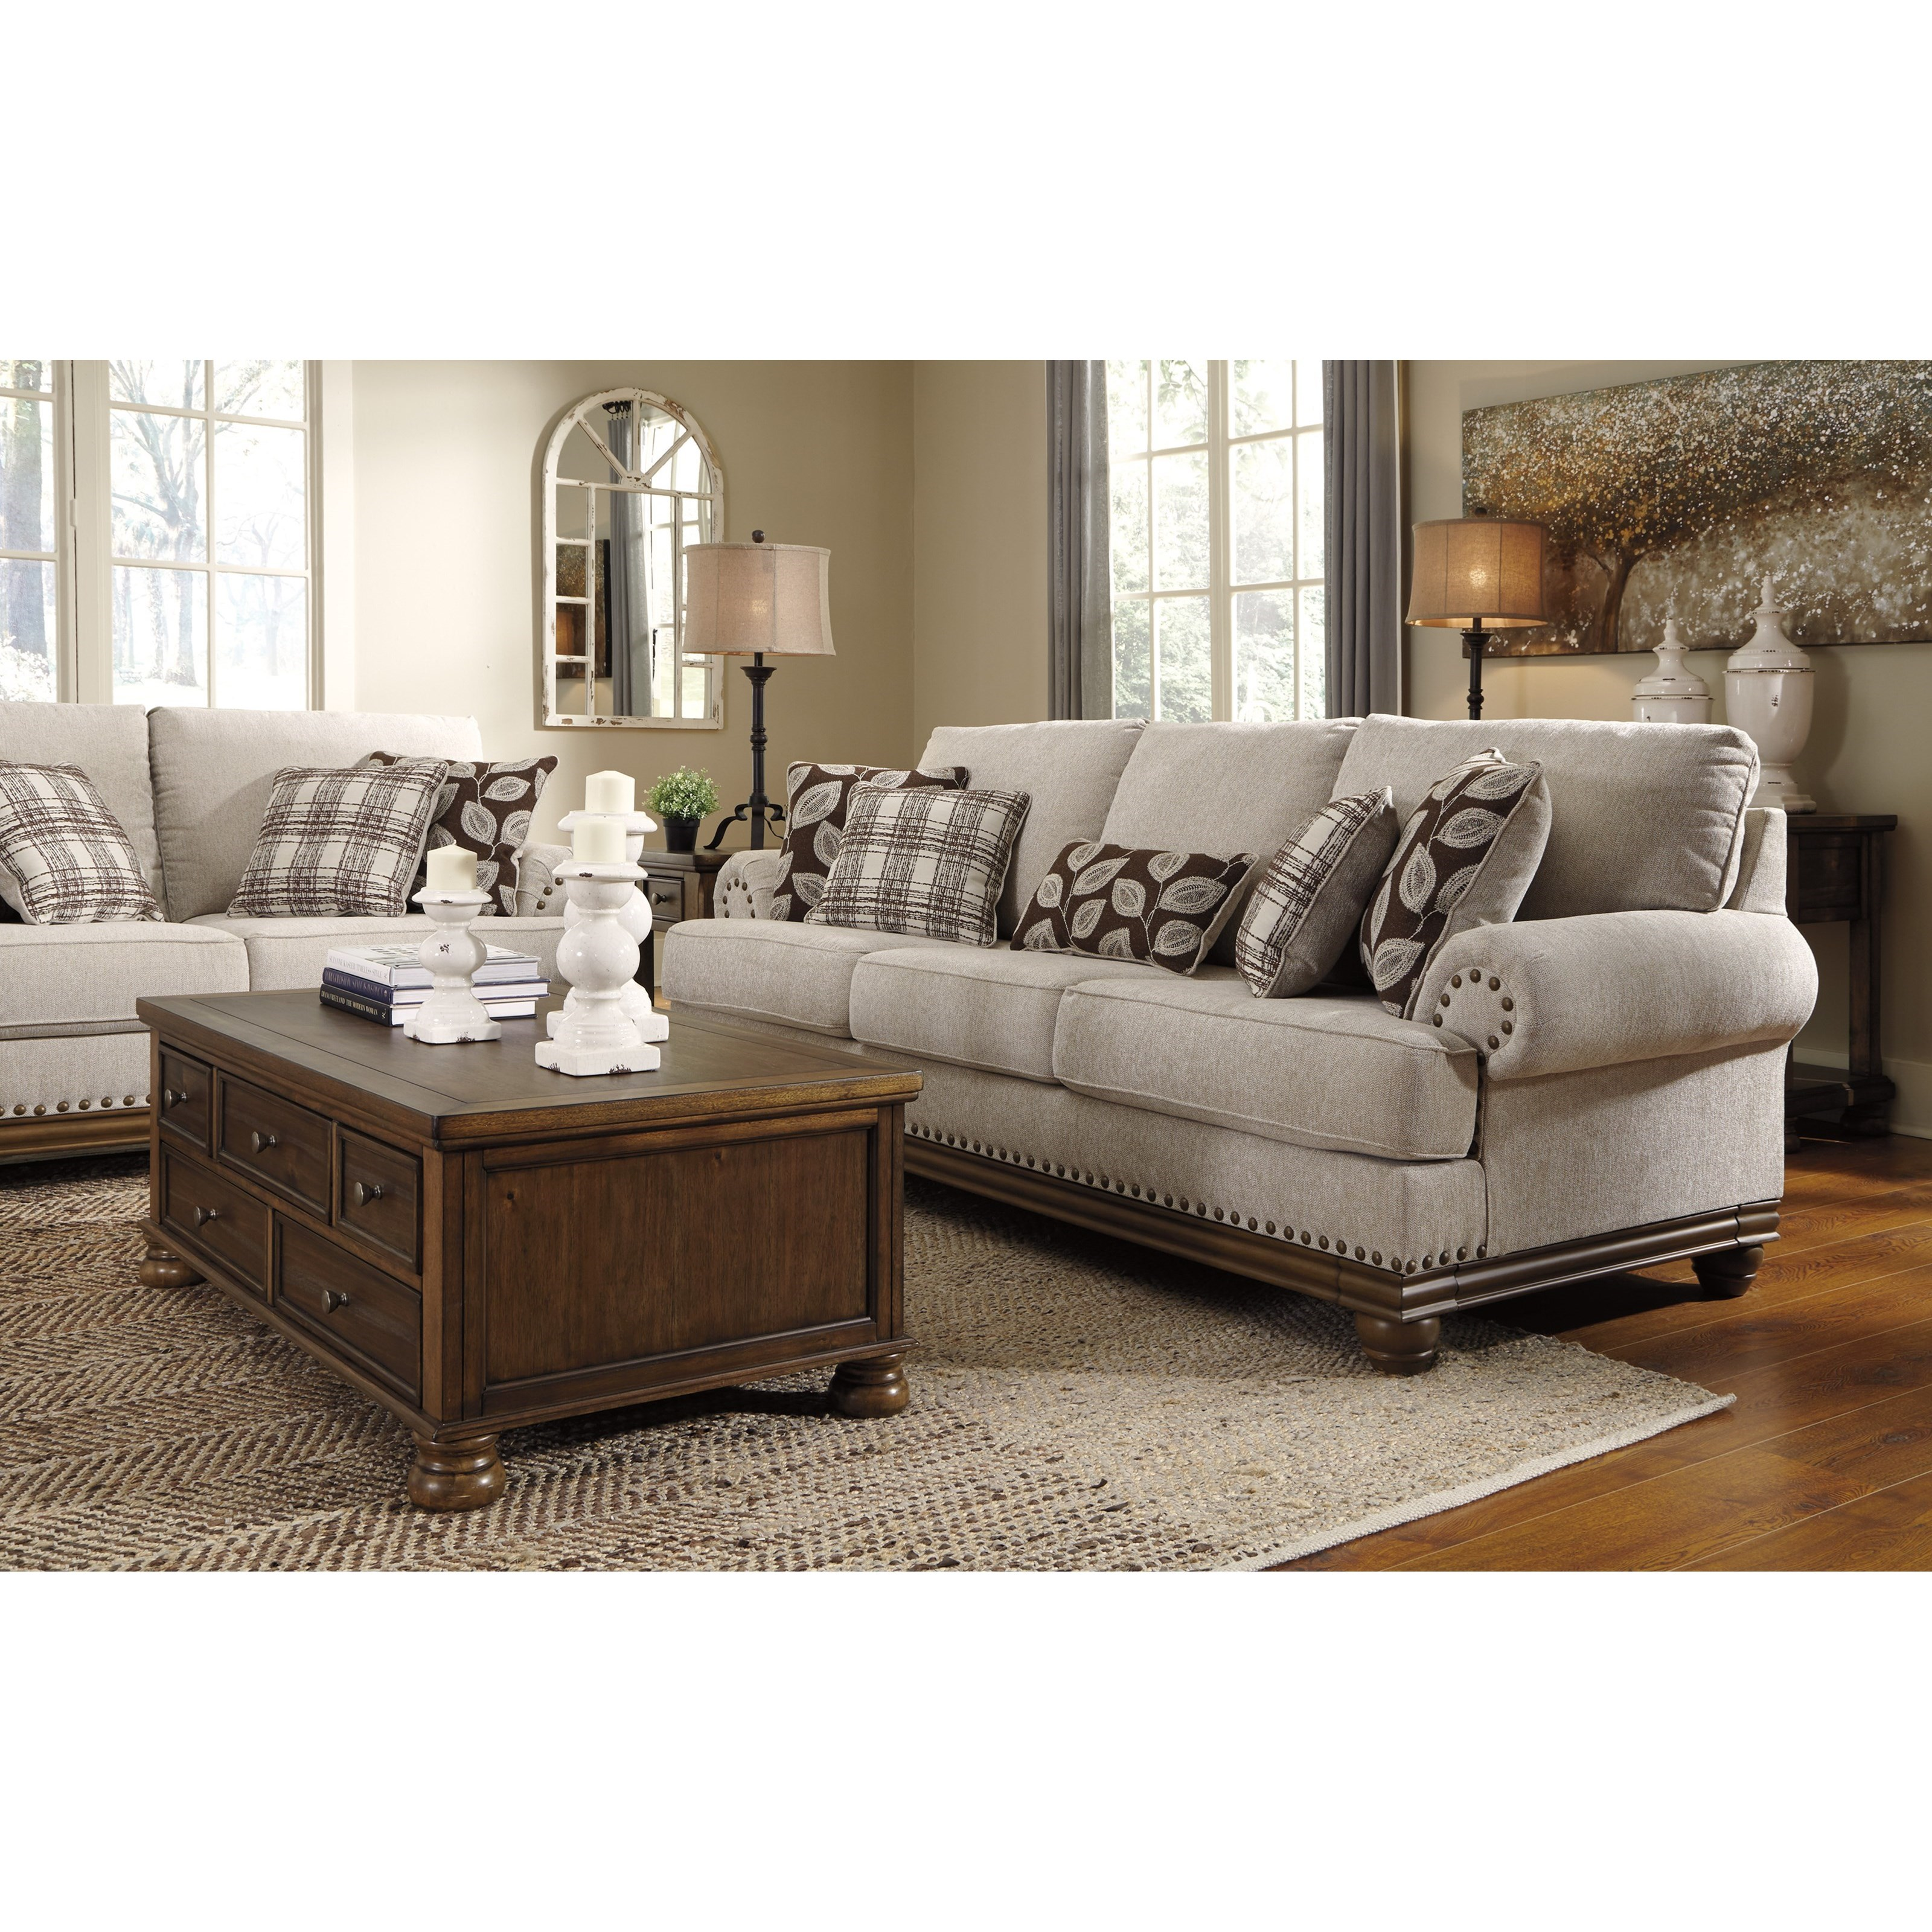 Transitional Style Living Room Furniture: Ashley Signature Design Harleson 1510438 Transitional Sofa